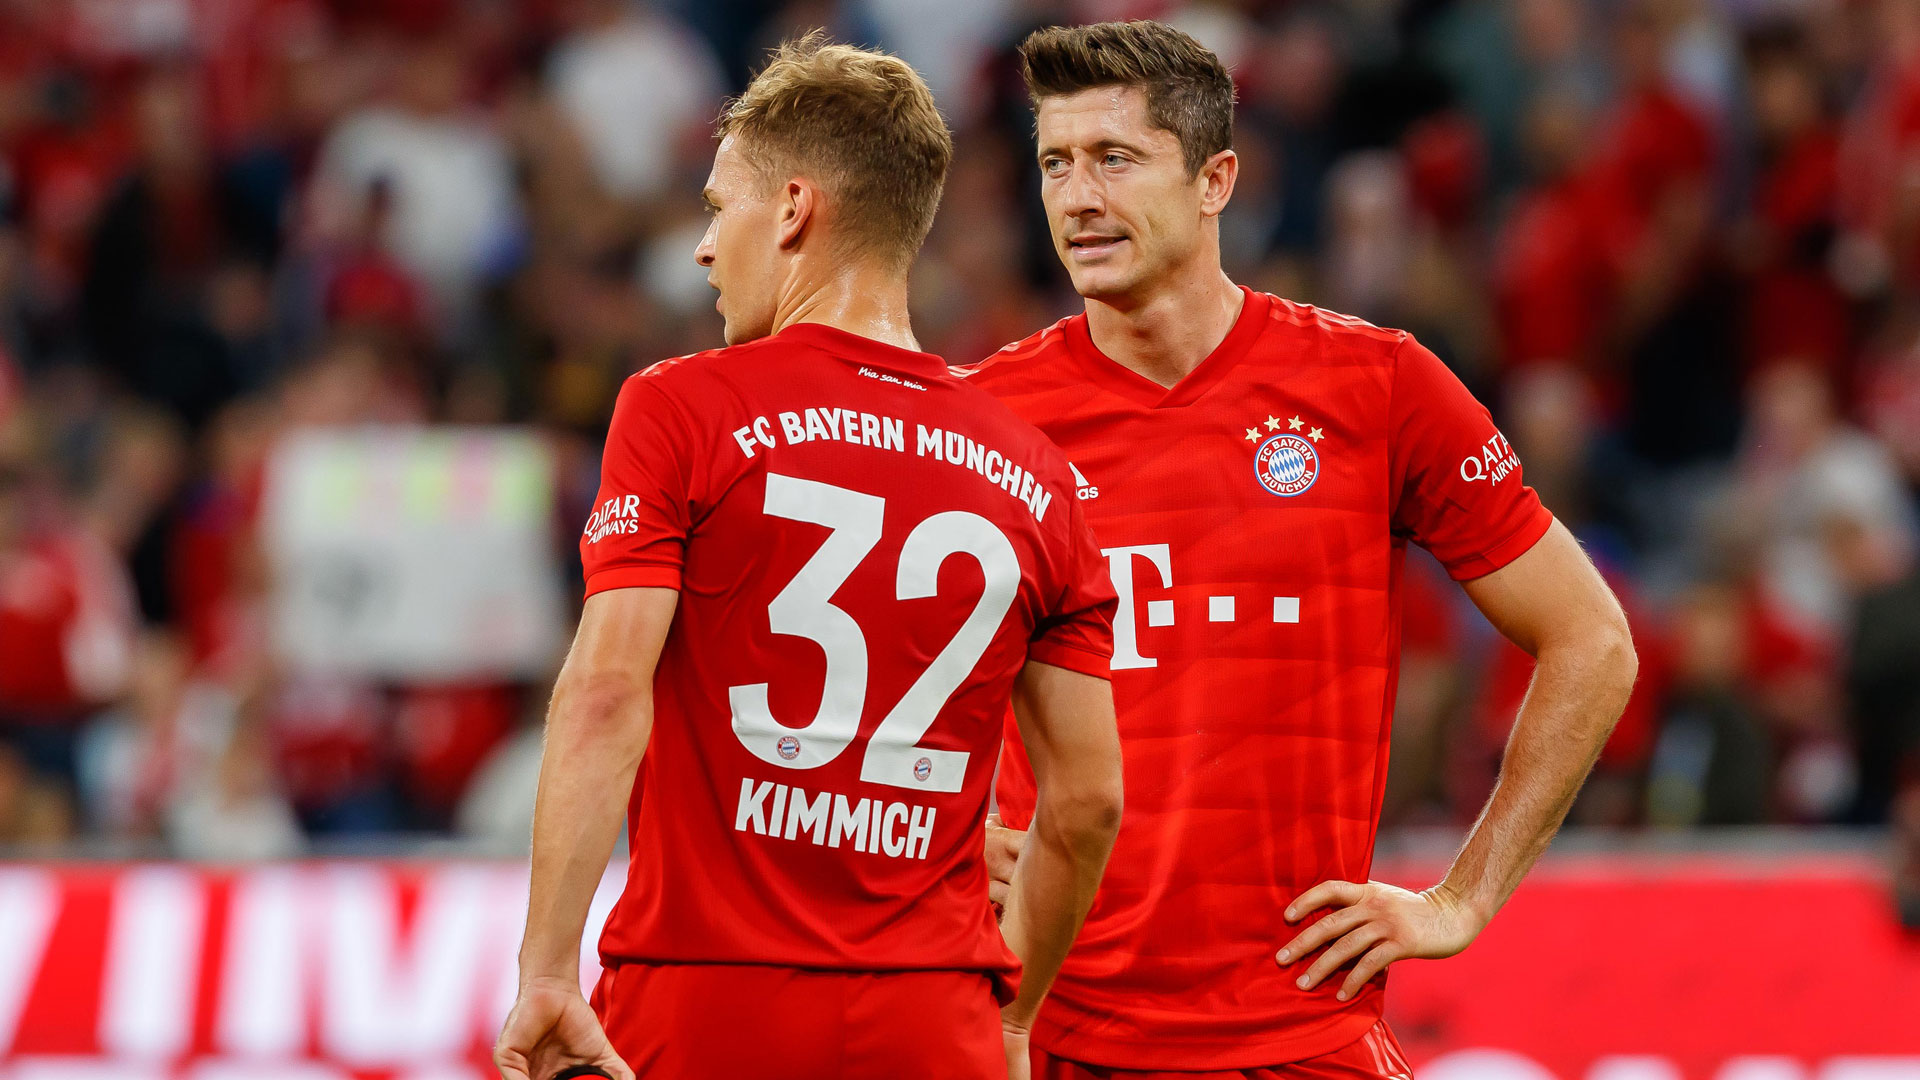 بایرن مونیخ / آلمان / بوندسلیگا / Bundesliga / Bayern Munchen / Poland